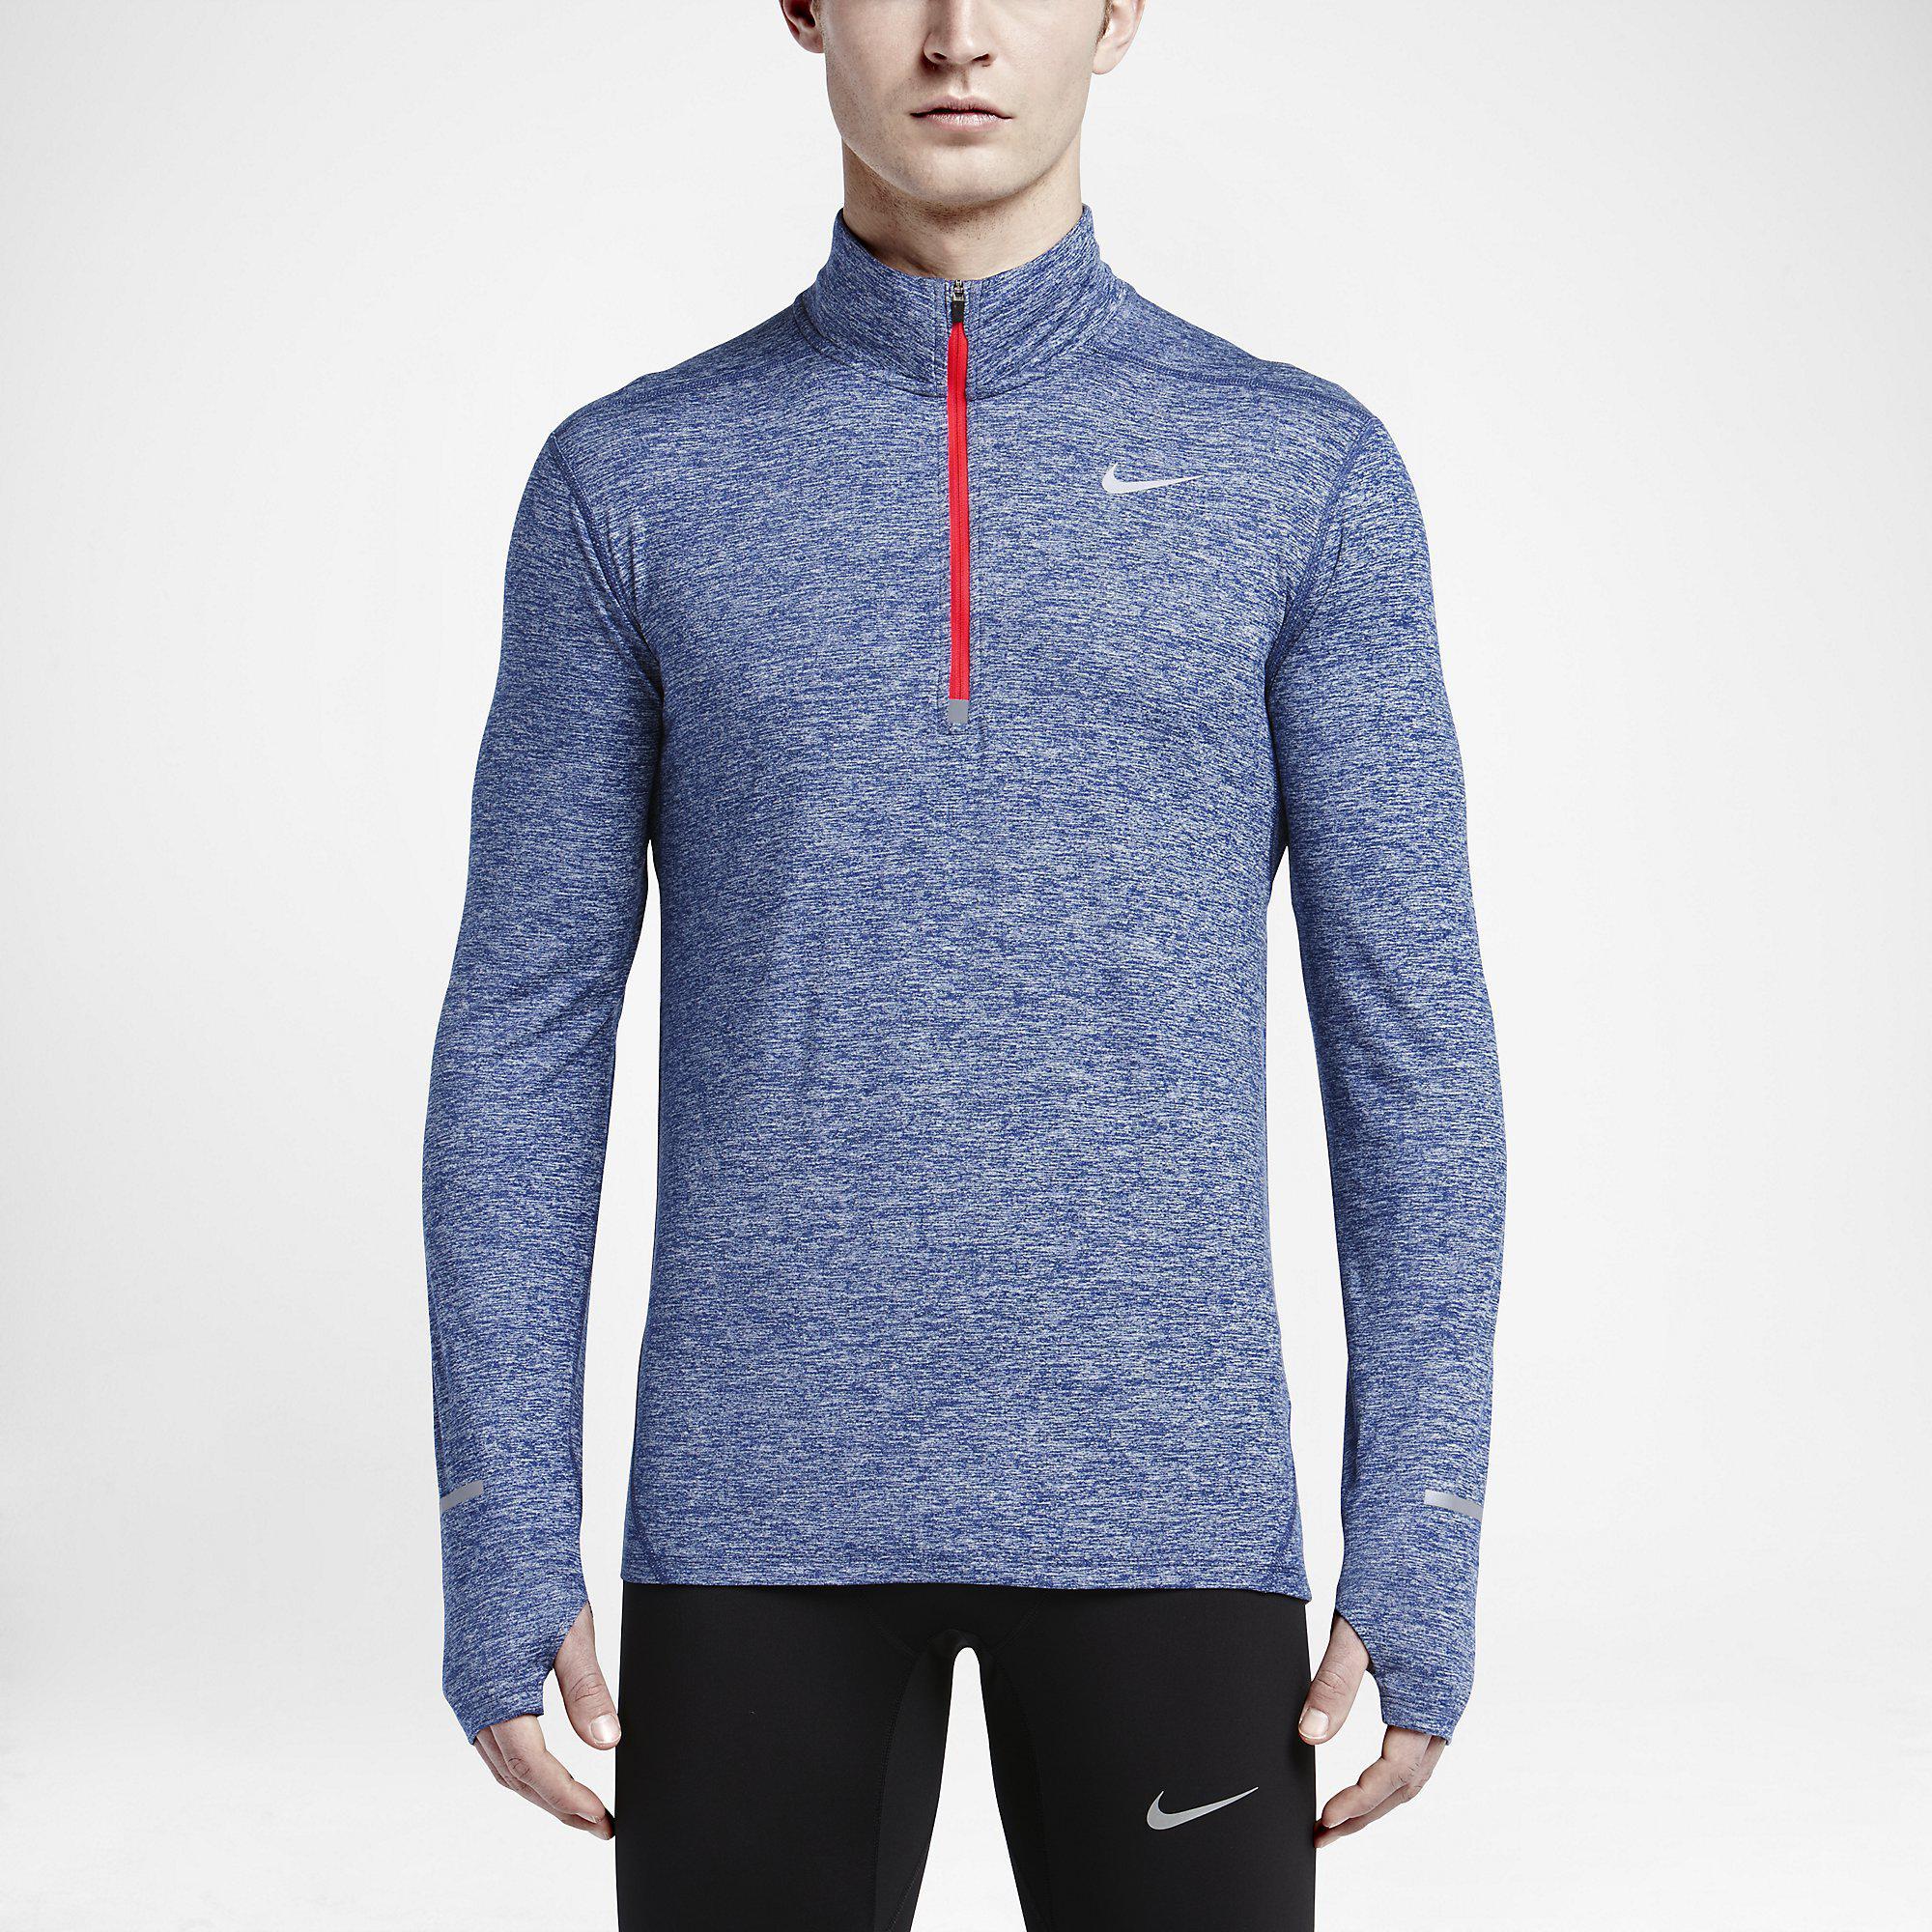 Out Of Stock. Nike Mens Dri-FIT Element Half-Zip Top - Deep Royal Blue ...